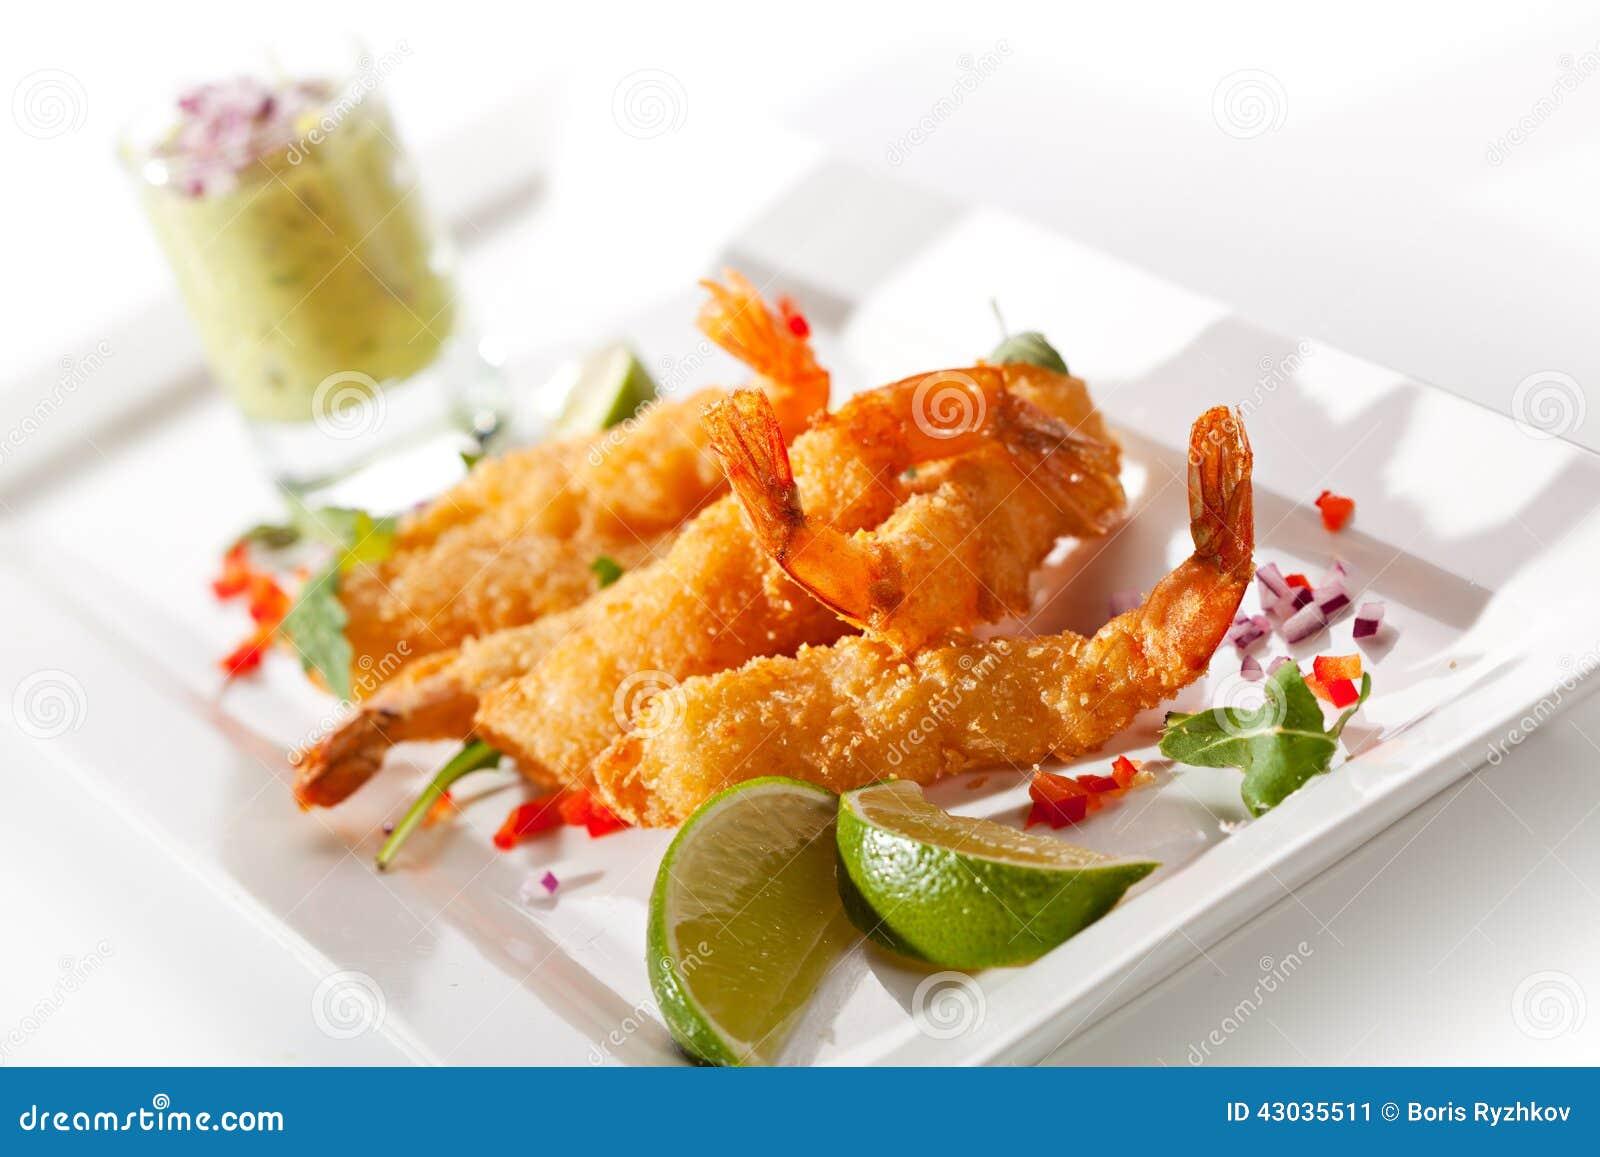 Deep Fried Shrimp with Guacamole Sauce and Lime Slice.